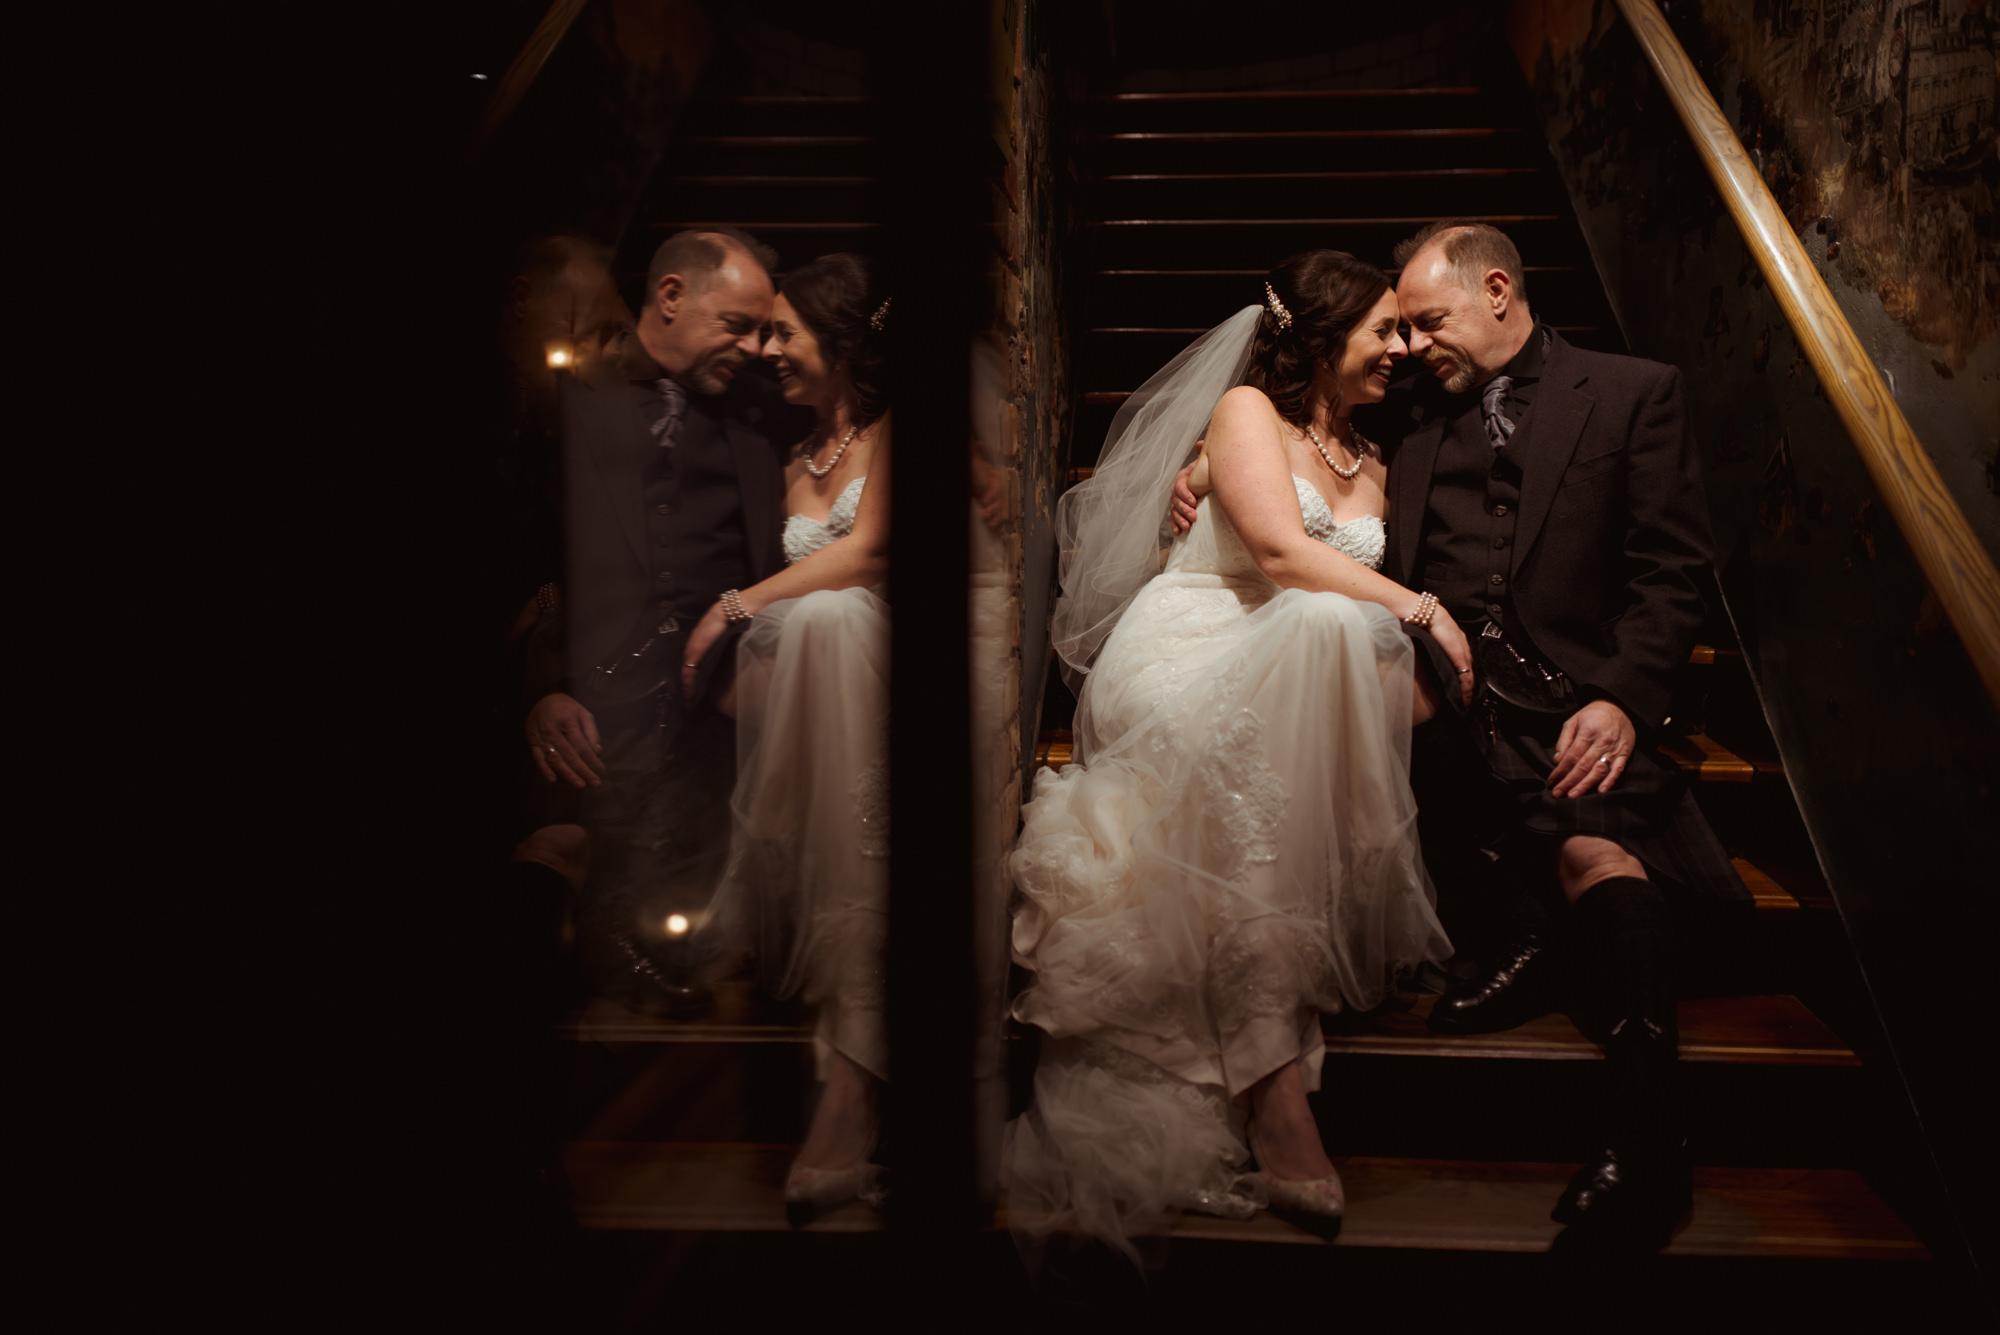 ubiquitous-chip-wedding-(1).jpg